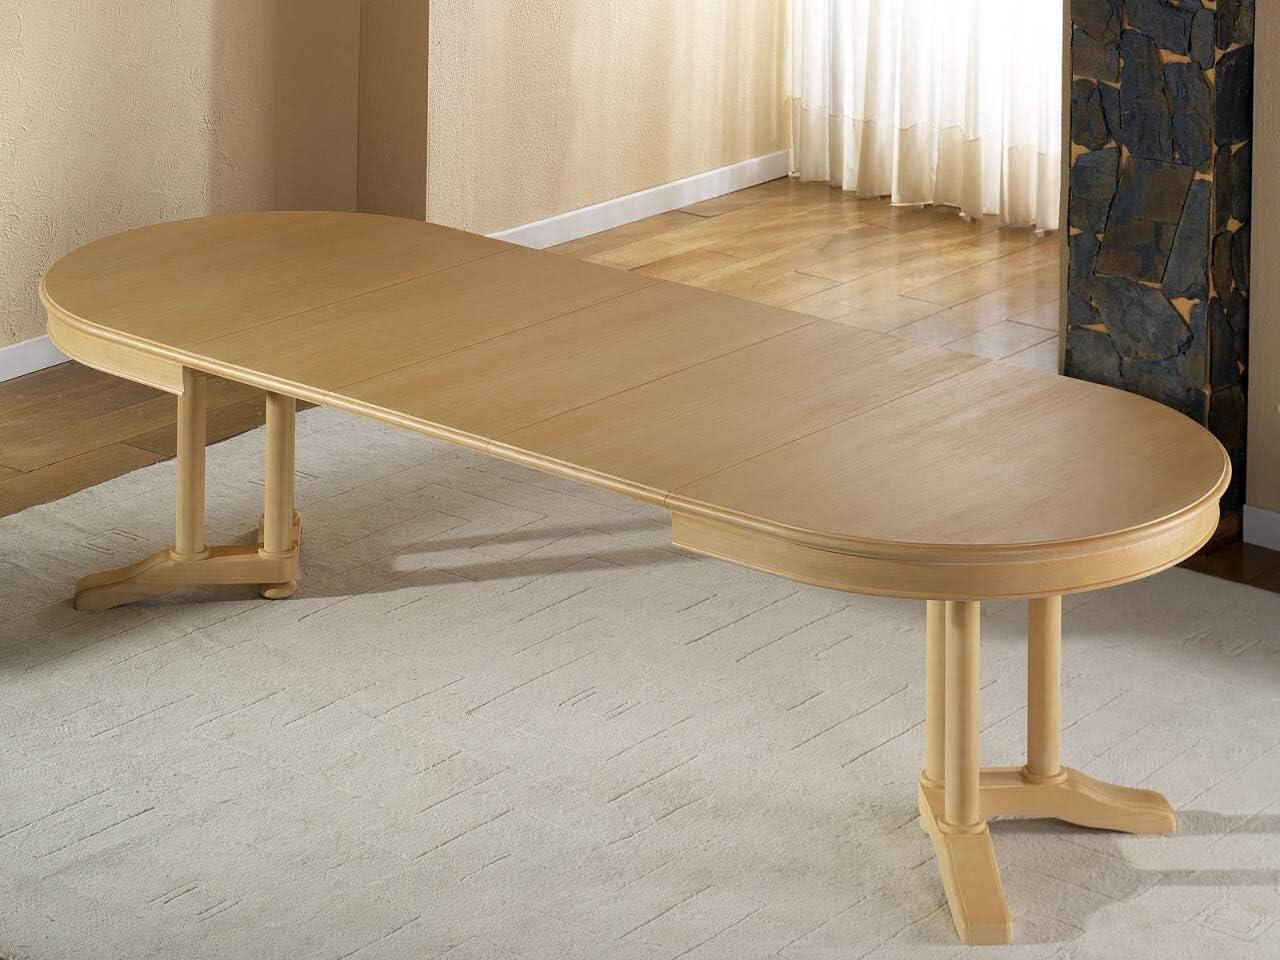 Soma Allegro - Mesa de Comedor Ovalada (160 x 110 cm, con Insertos ...